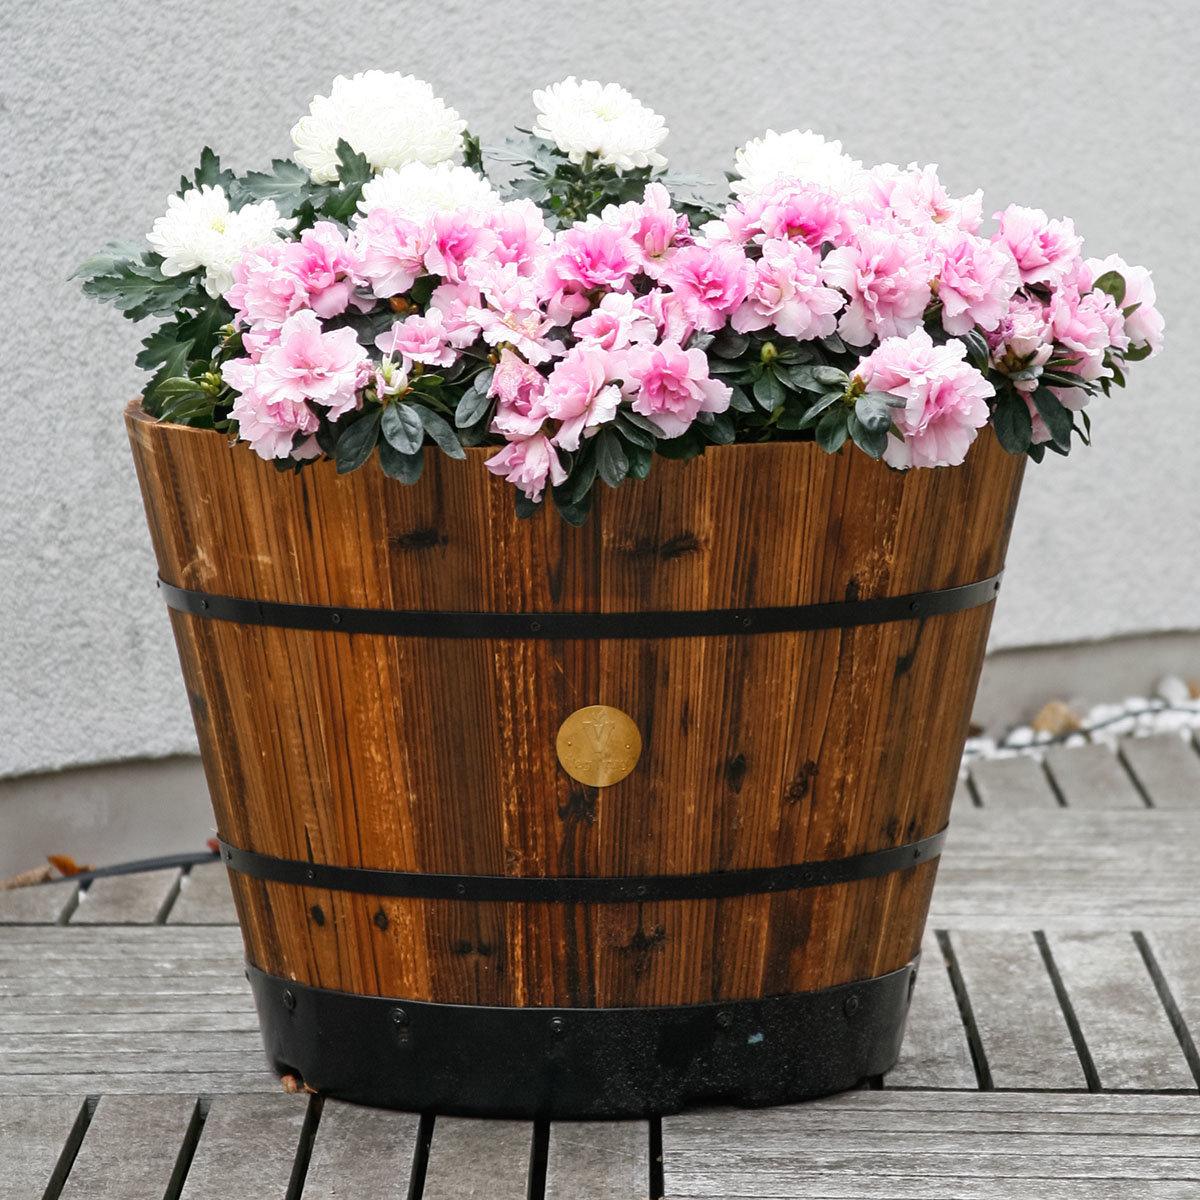 Pflanzfass Brandy, 41x55x55 cm, braun